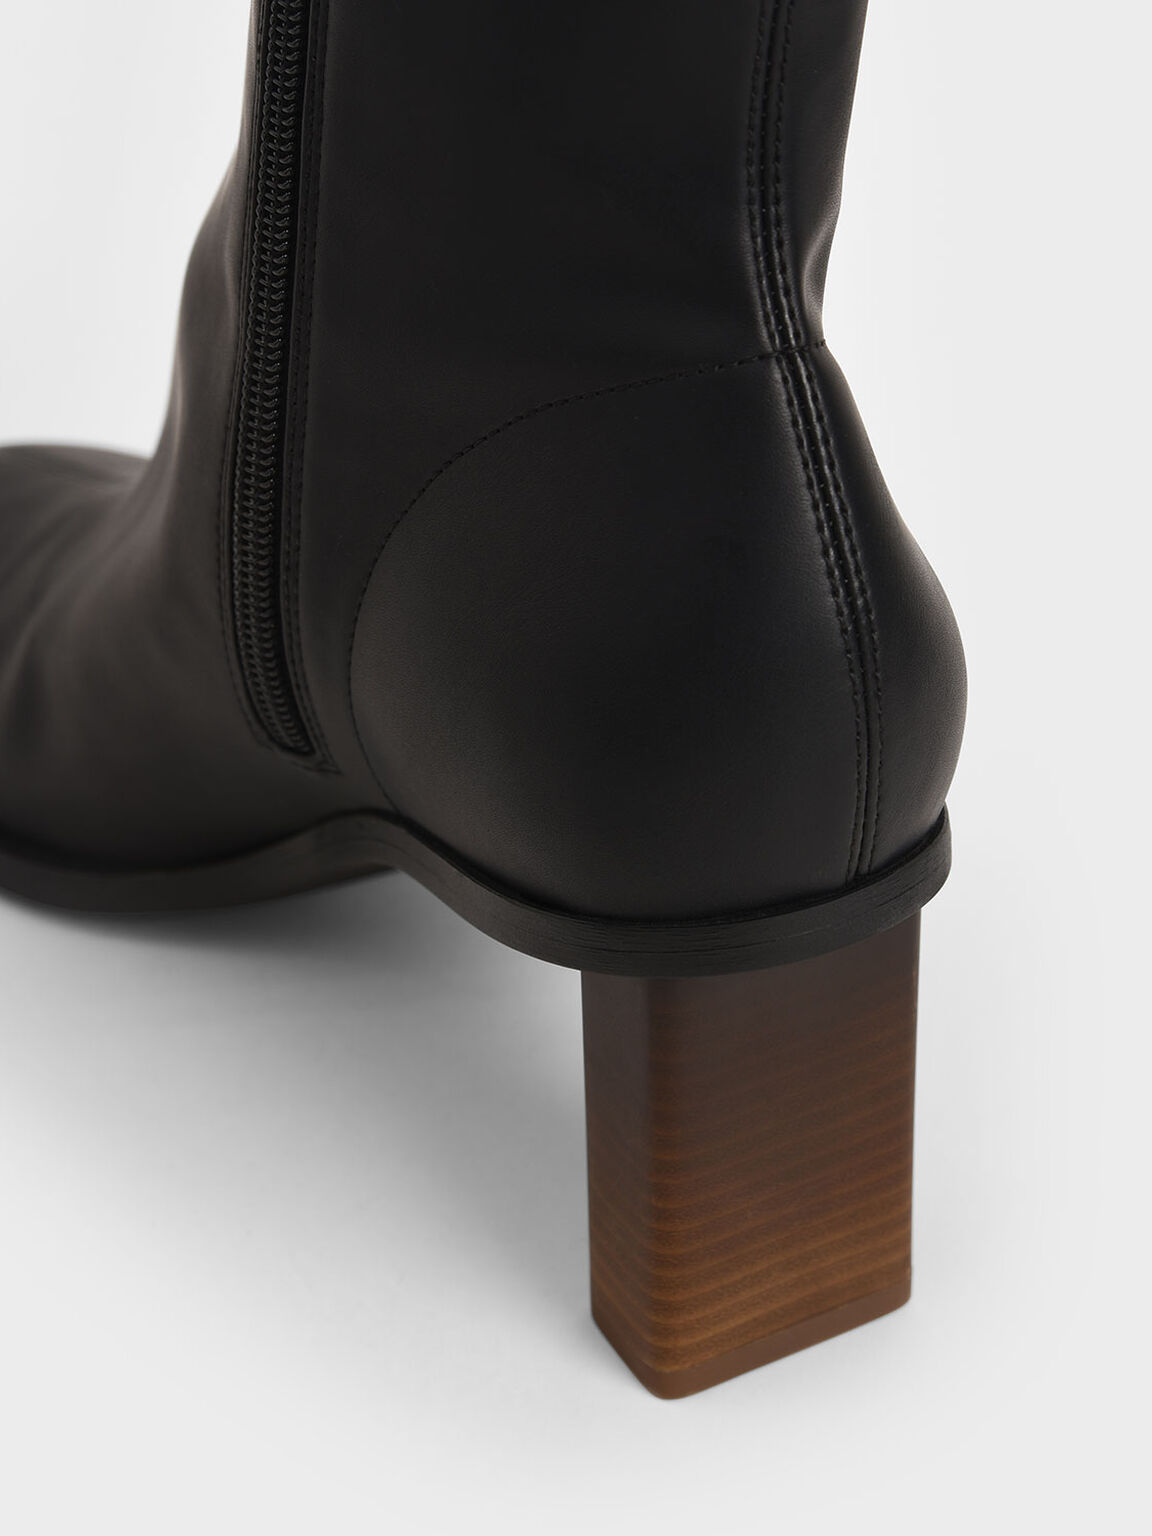 方形粗跟短靴, 黑色, hi-res